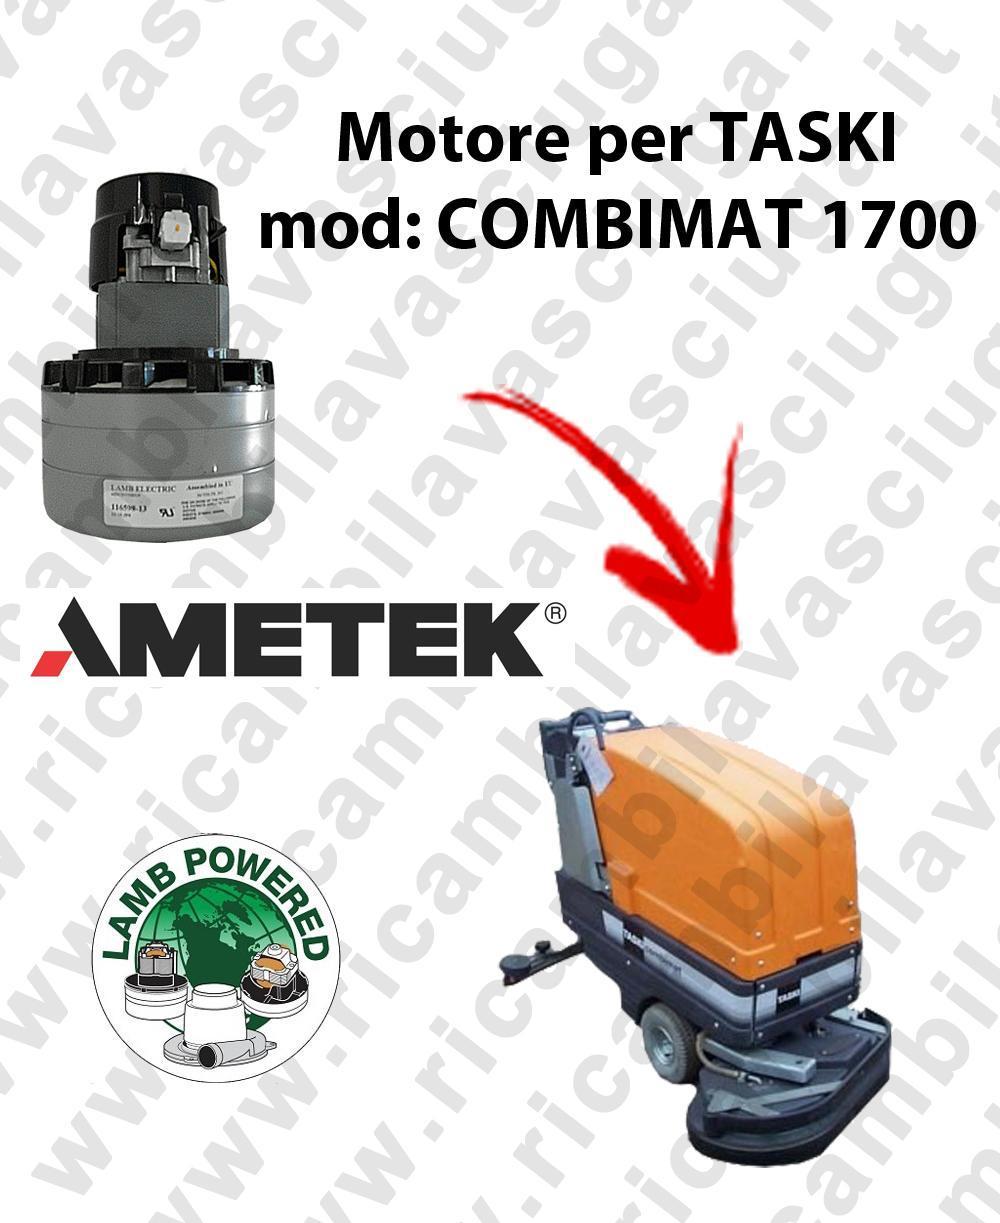 COMBIMAT 1700 Saugmotor LAMB AMETEK für scheuersaugmaschinen TASKI